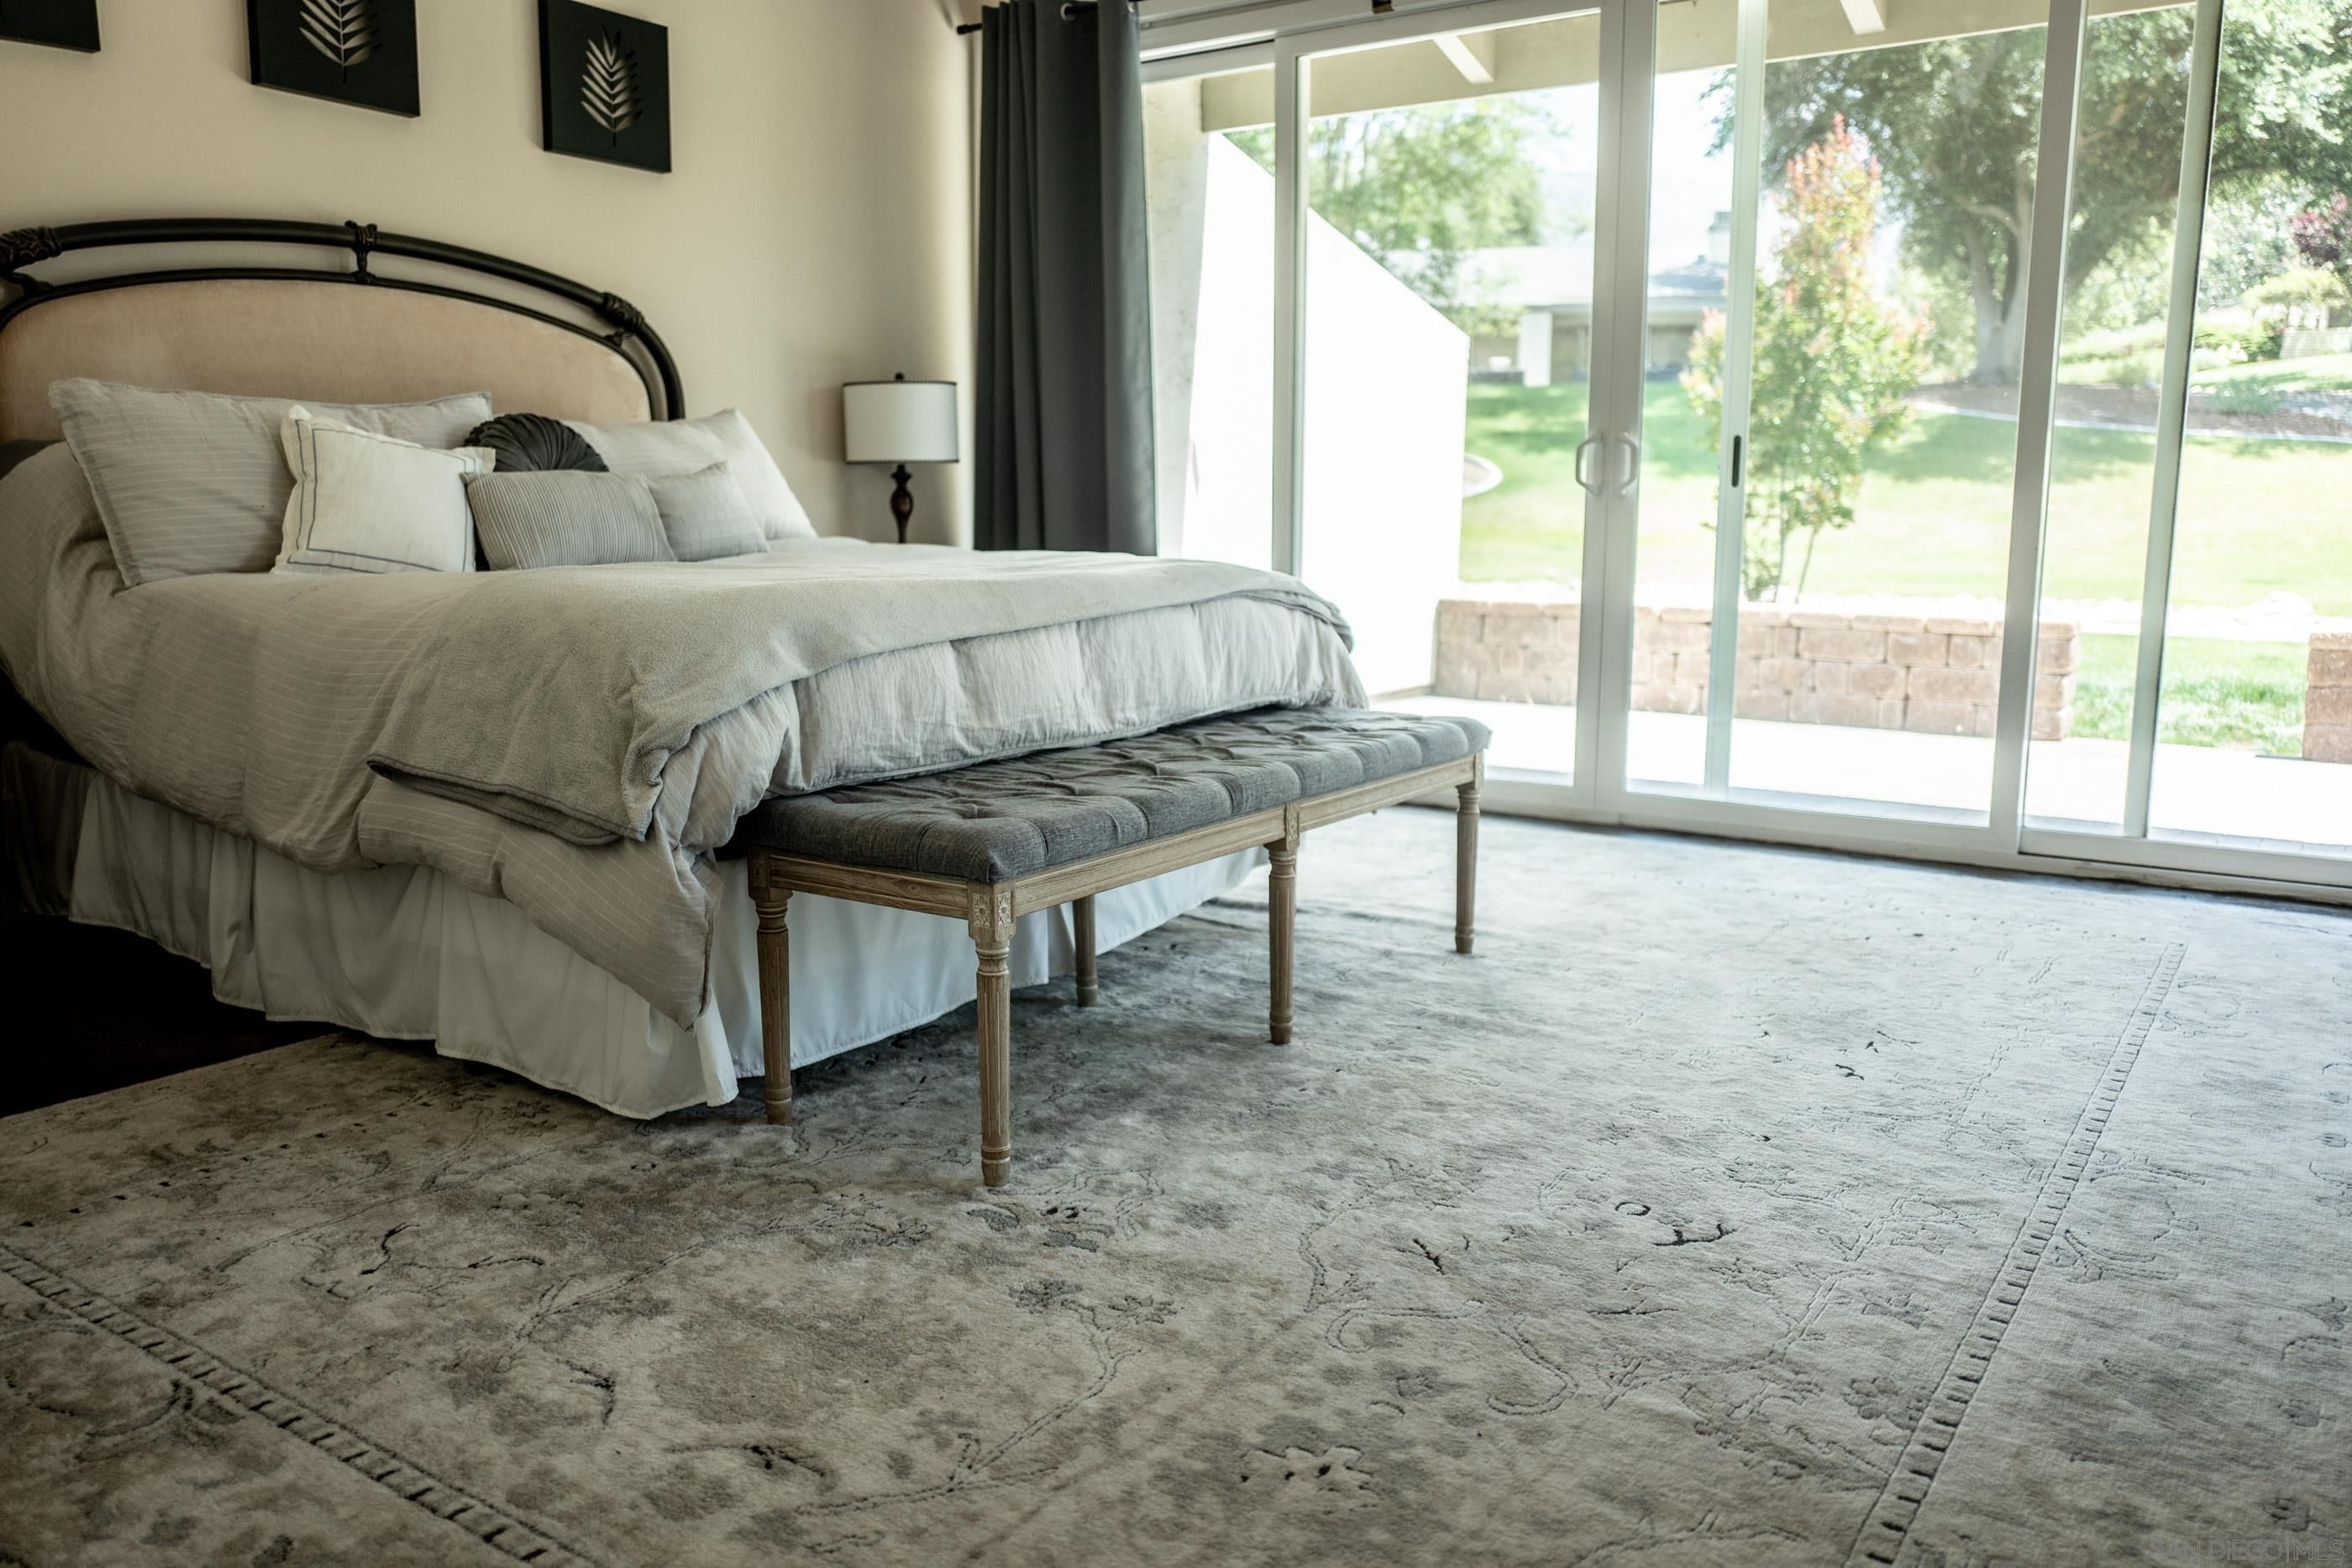 Main Photo: PAUMA VALLEY Condo for sale : 3 bedrooms : 32579 Luiseno Circle Dr #54